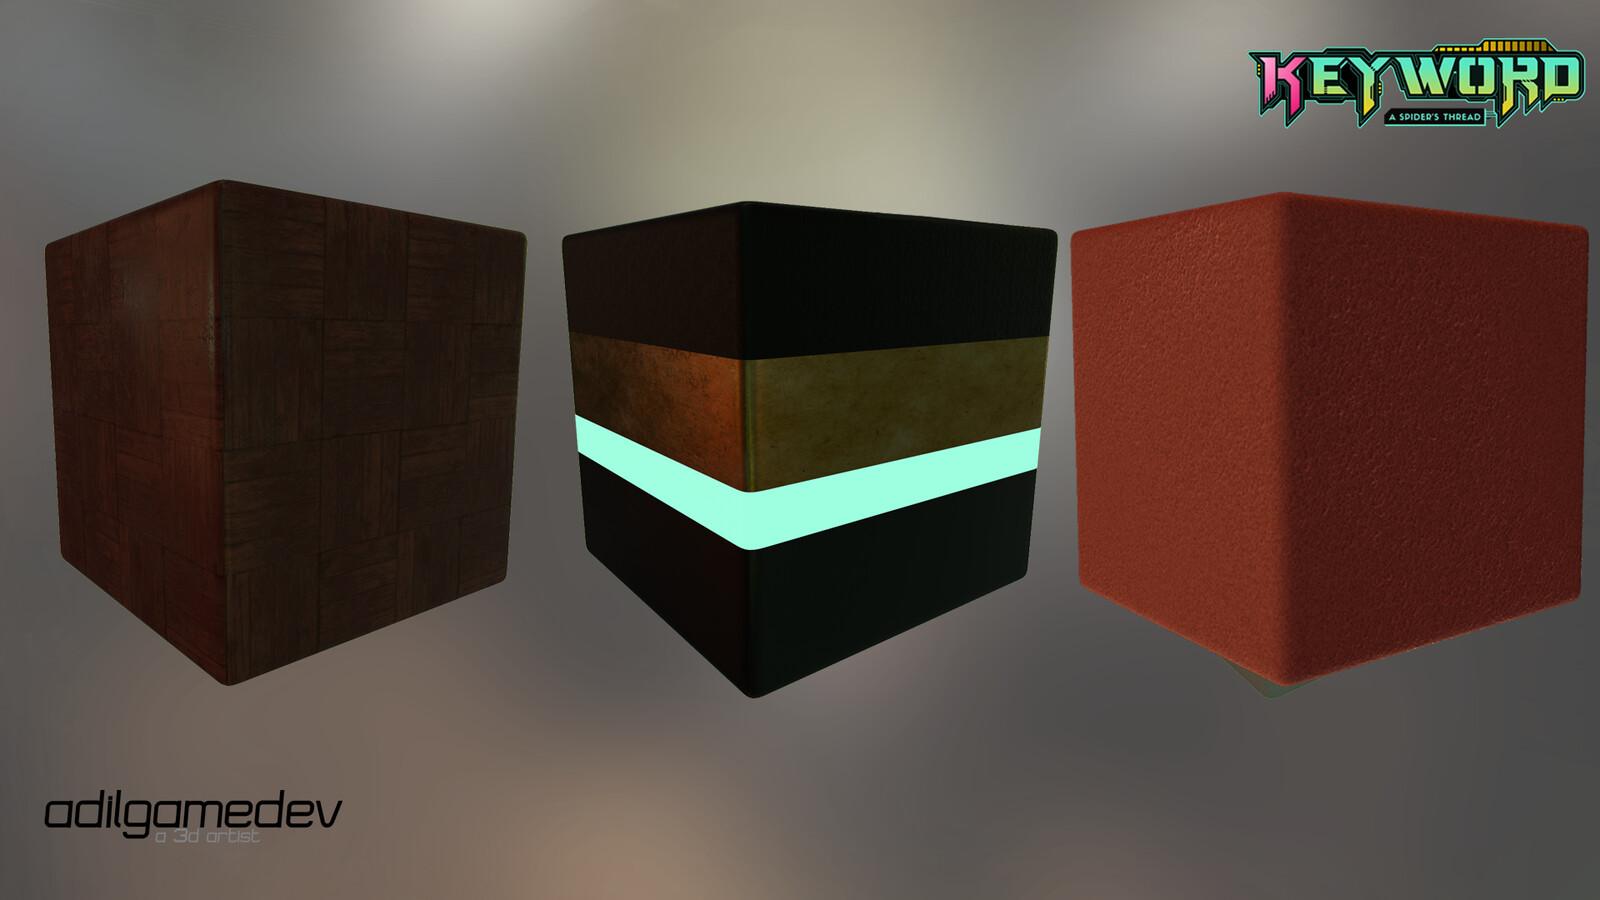 Sole architecture textures